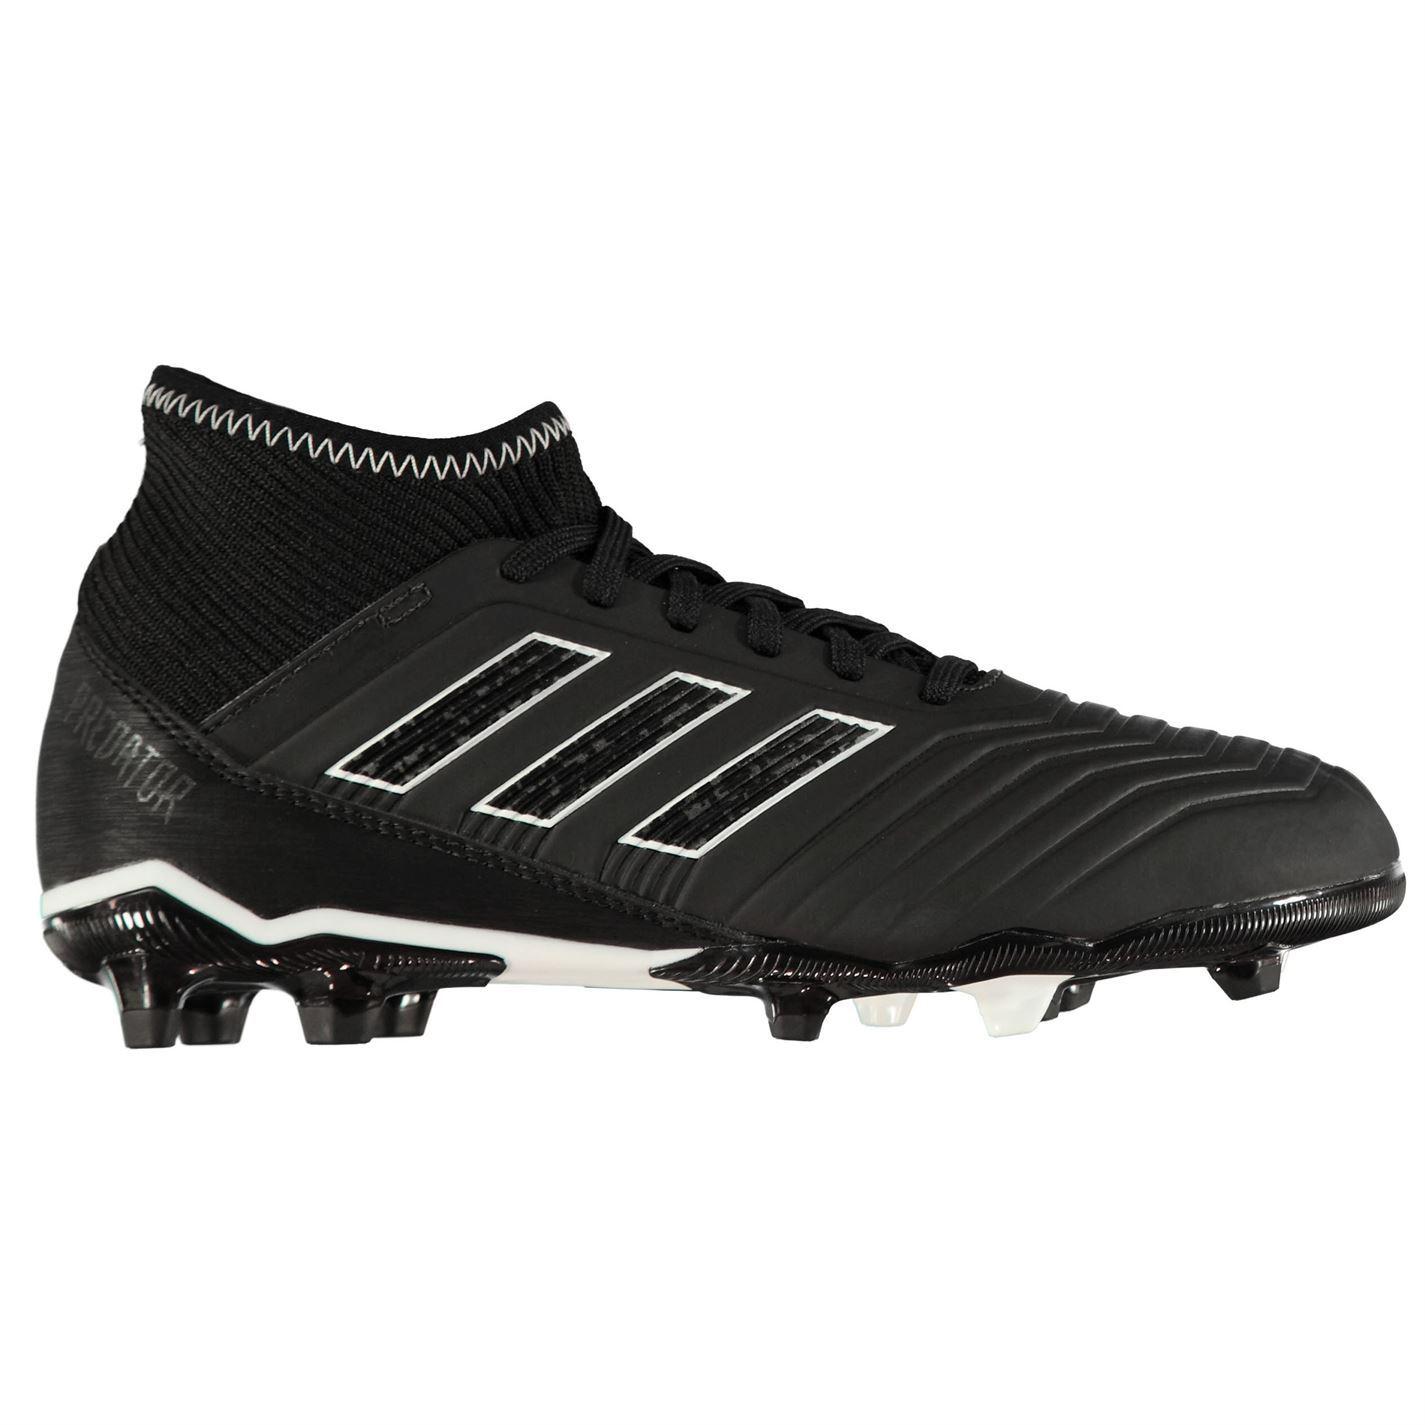 ... adidas Predator 18.3 Firm Ground FG Football Boots Childs Black Soccer  Cleats ... 2cb2ae4c203d8